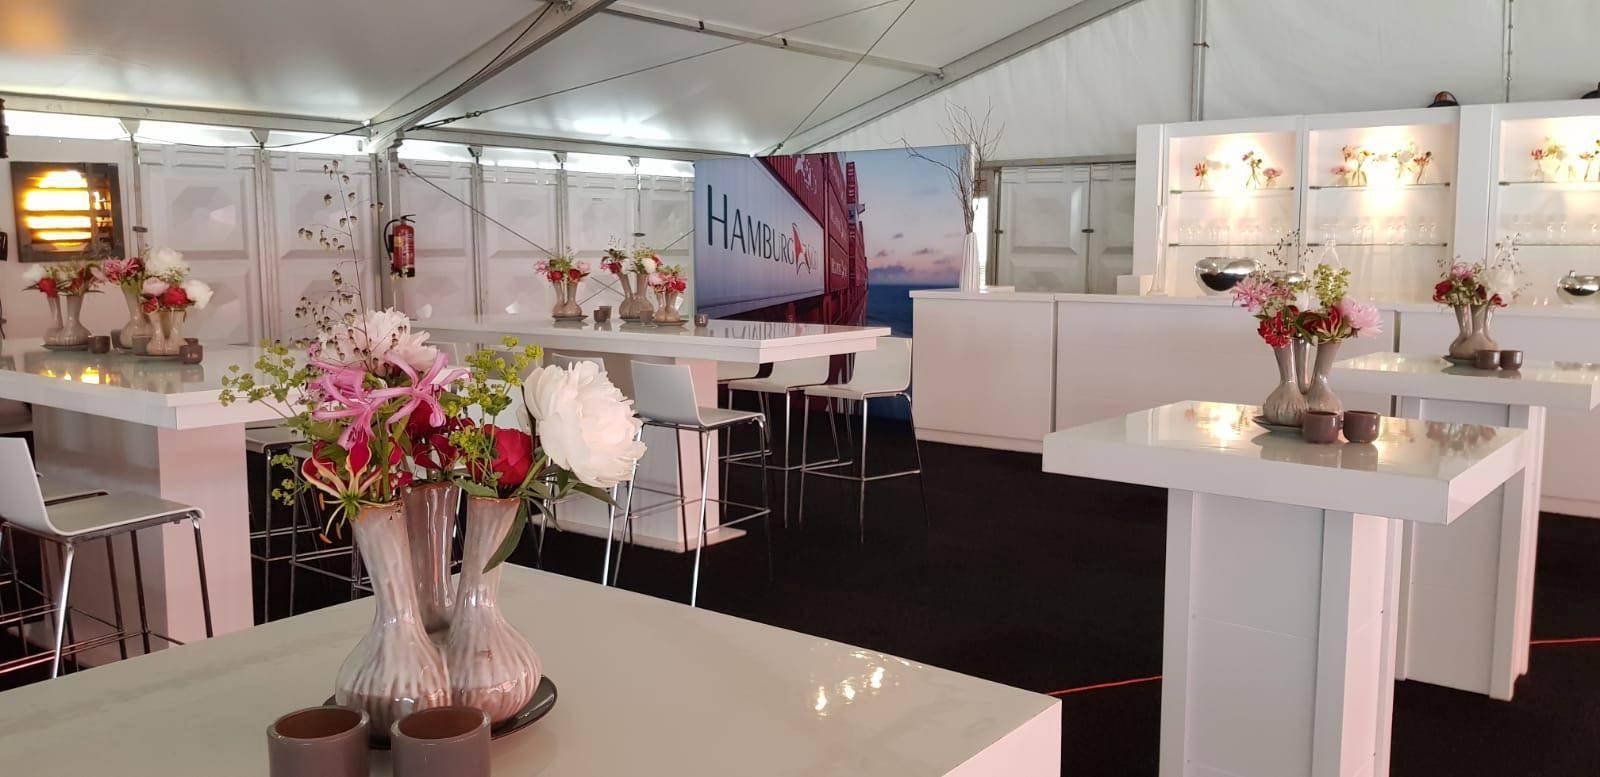 Wolterinck Event Decoration - Verhuur & Decoratie - House of Events - 5